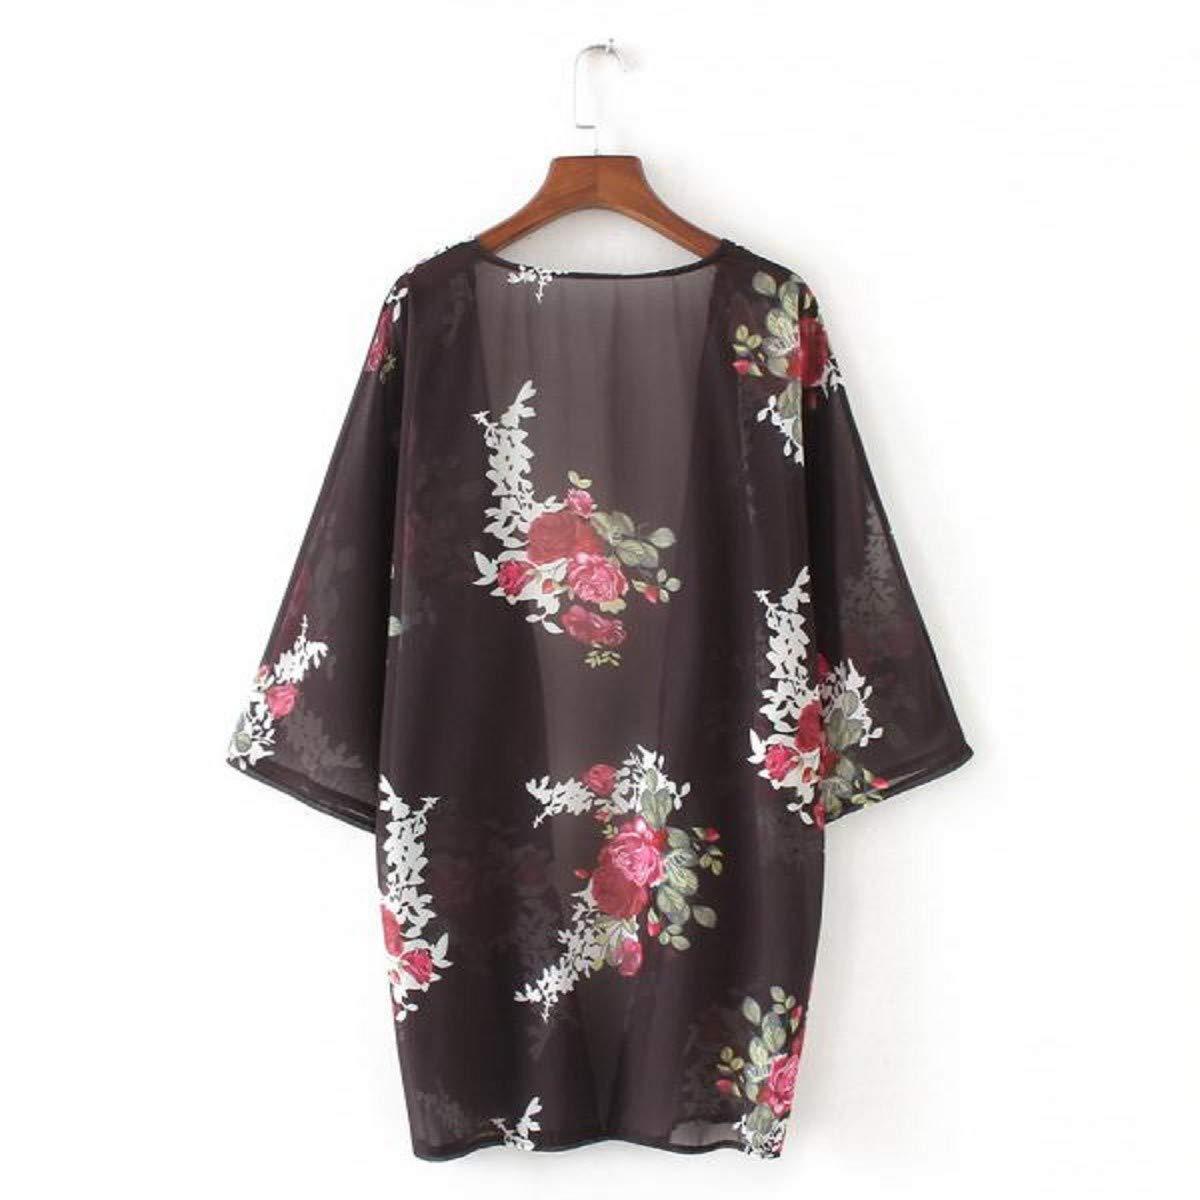 OTINICE Women's Chiffon Kimono Cardigans Floral Puff Sleeve Casual Loose Swimwear Cover ups Black by OTINICE (Image #4)